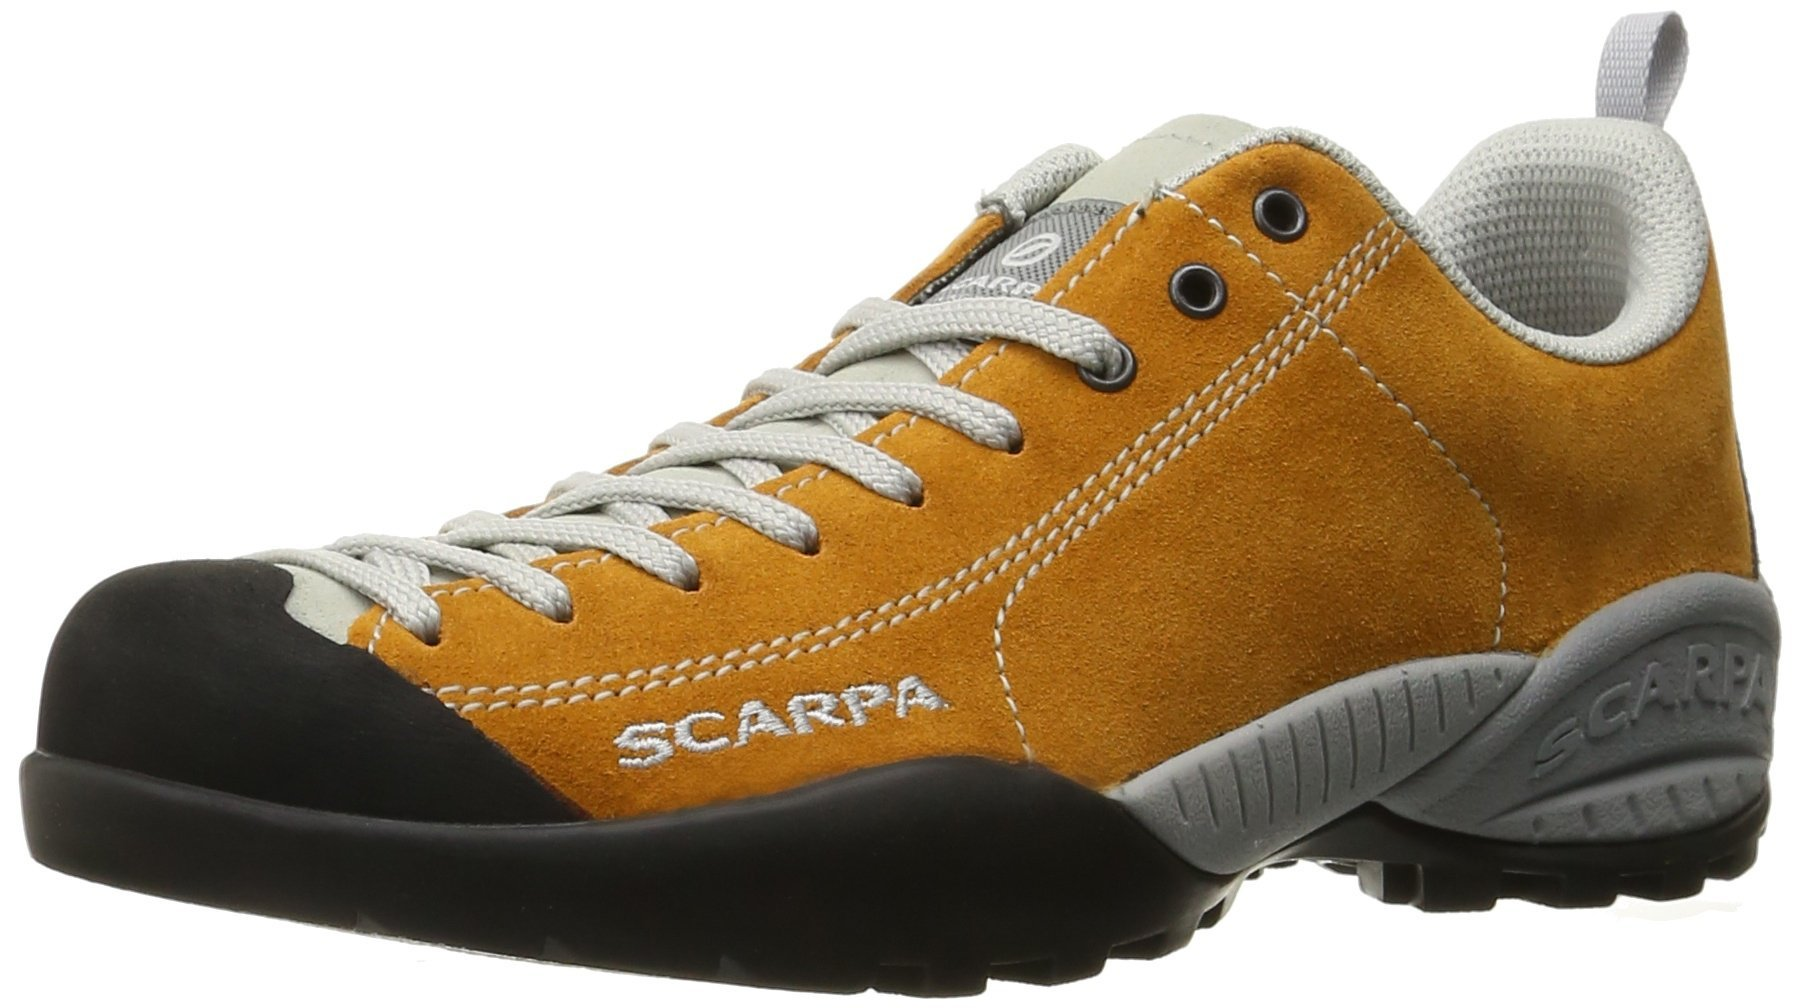 SCARPA Women's Mojito Casual Shoe, ocra, 39 EU/7.5 M US